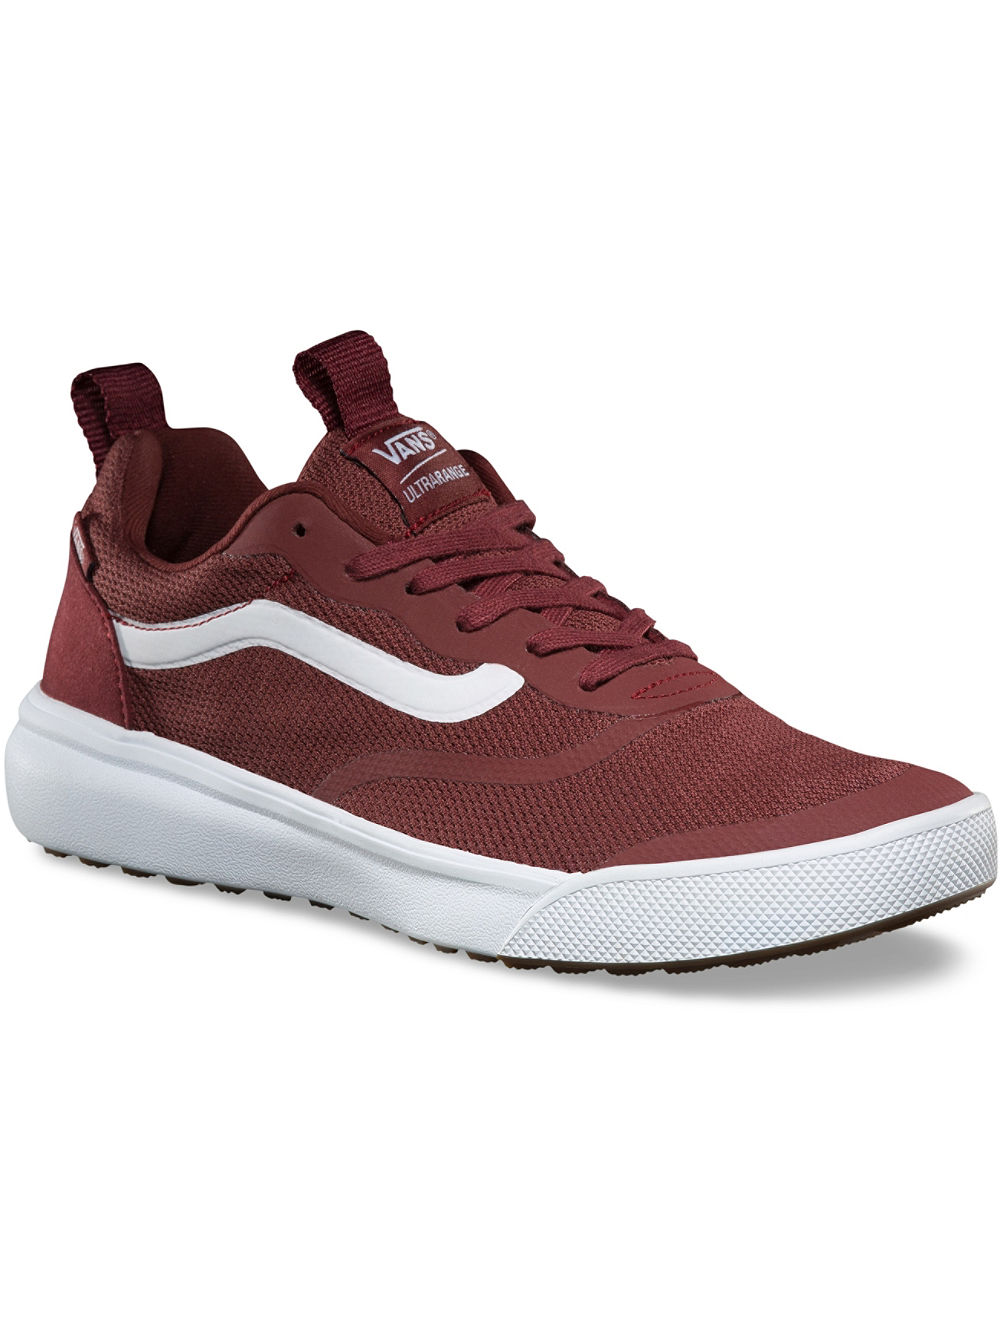 c65b264bb6a Buy Vans Ultrarange Rapidweld Sneakers online at Blue Tomato